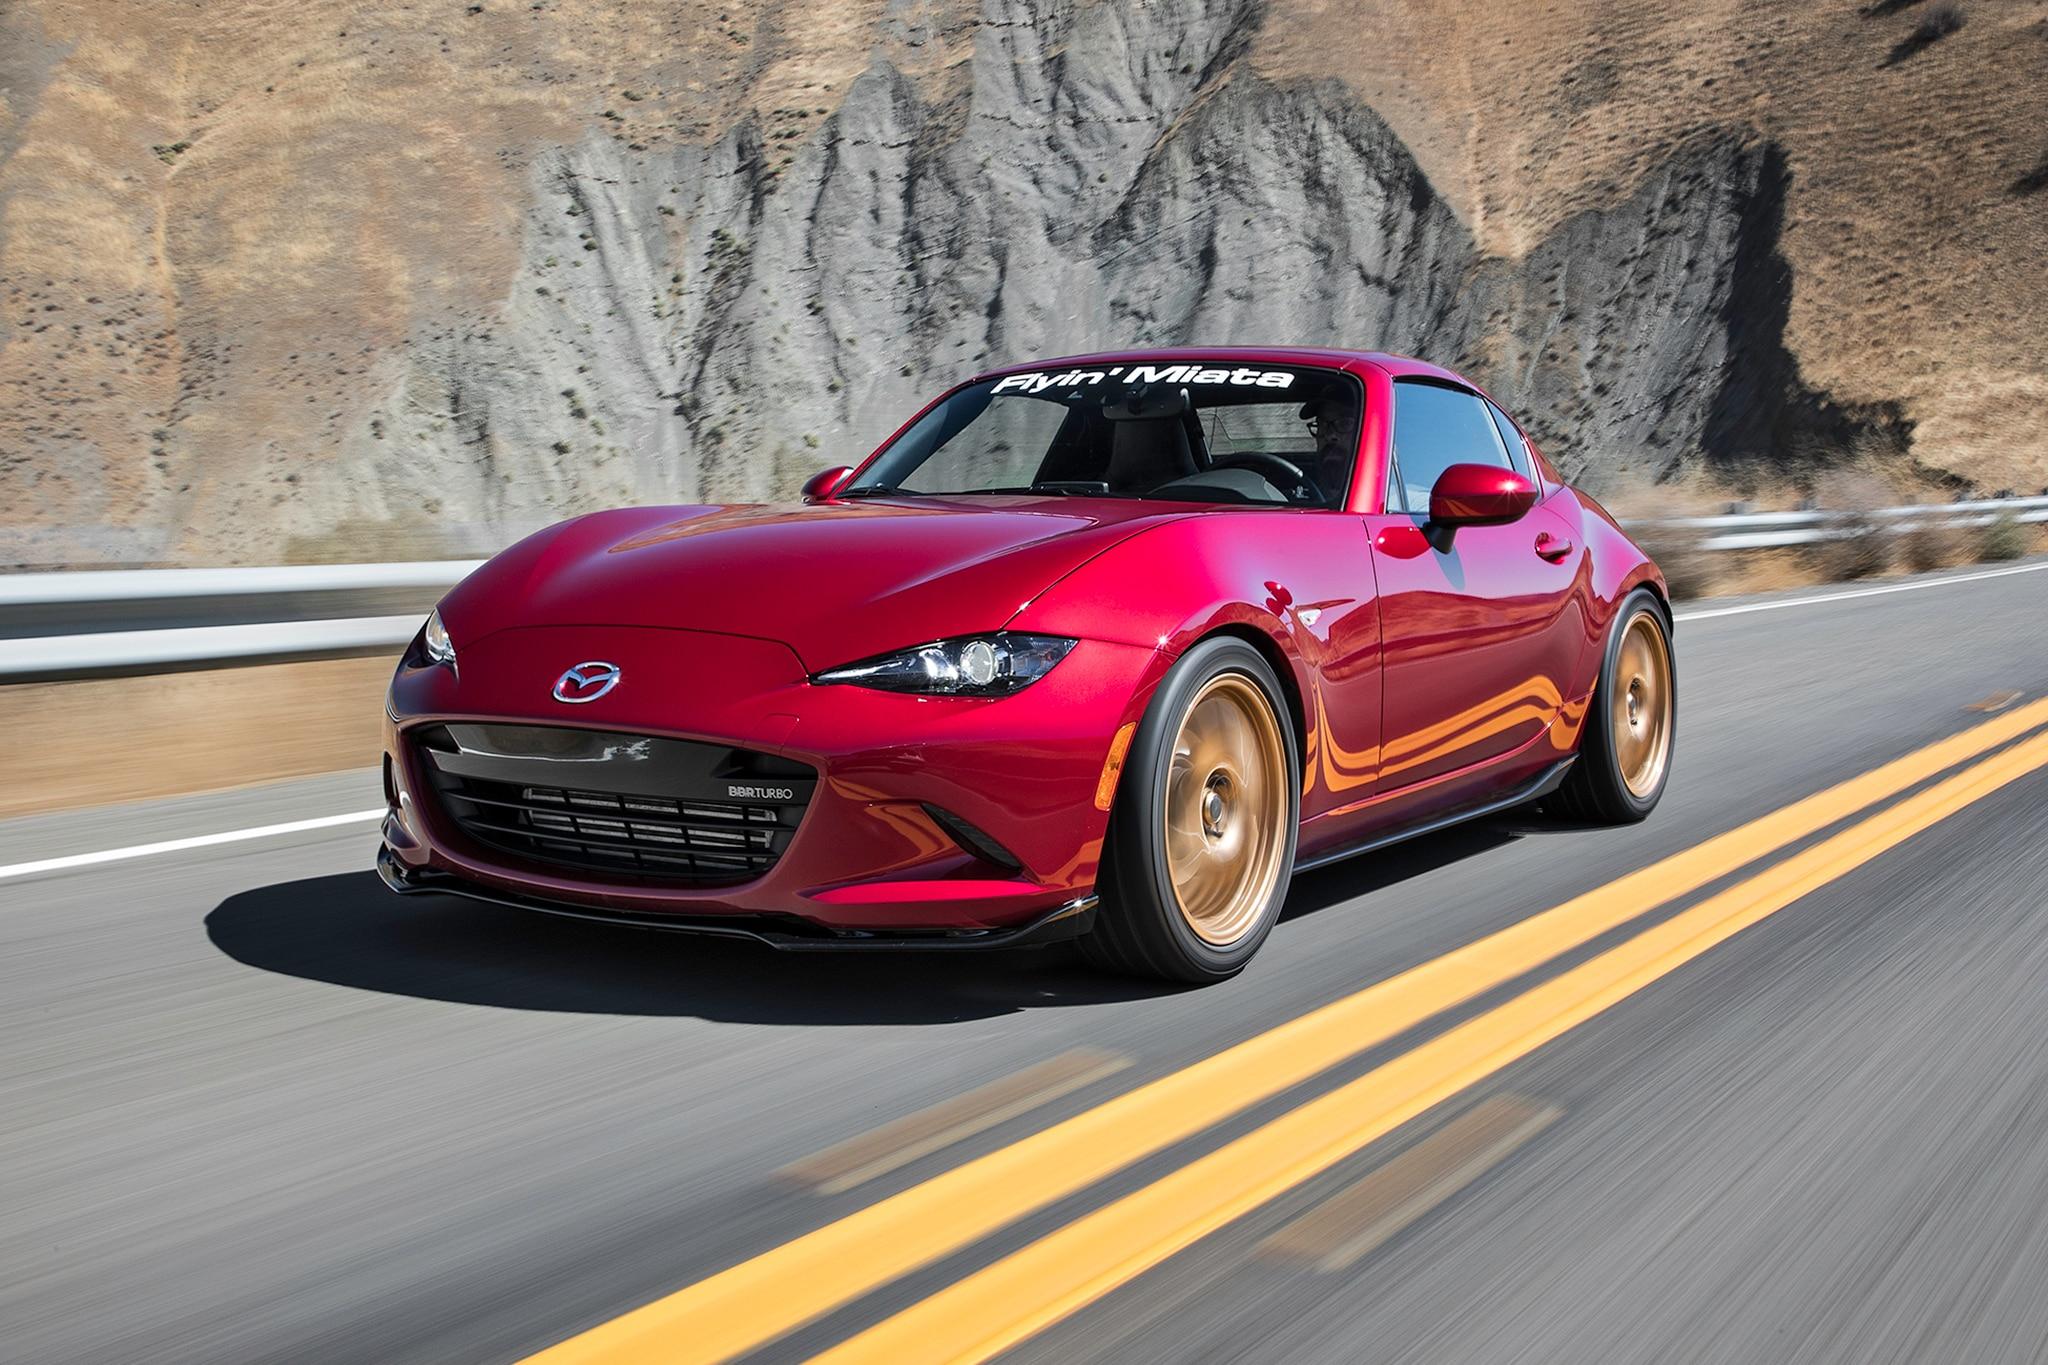 Kelebihan Mazda Mx5 Turbo Review